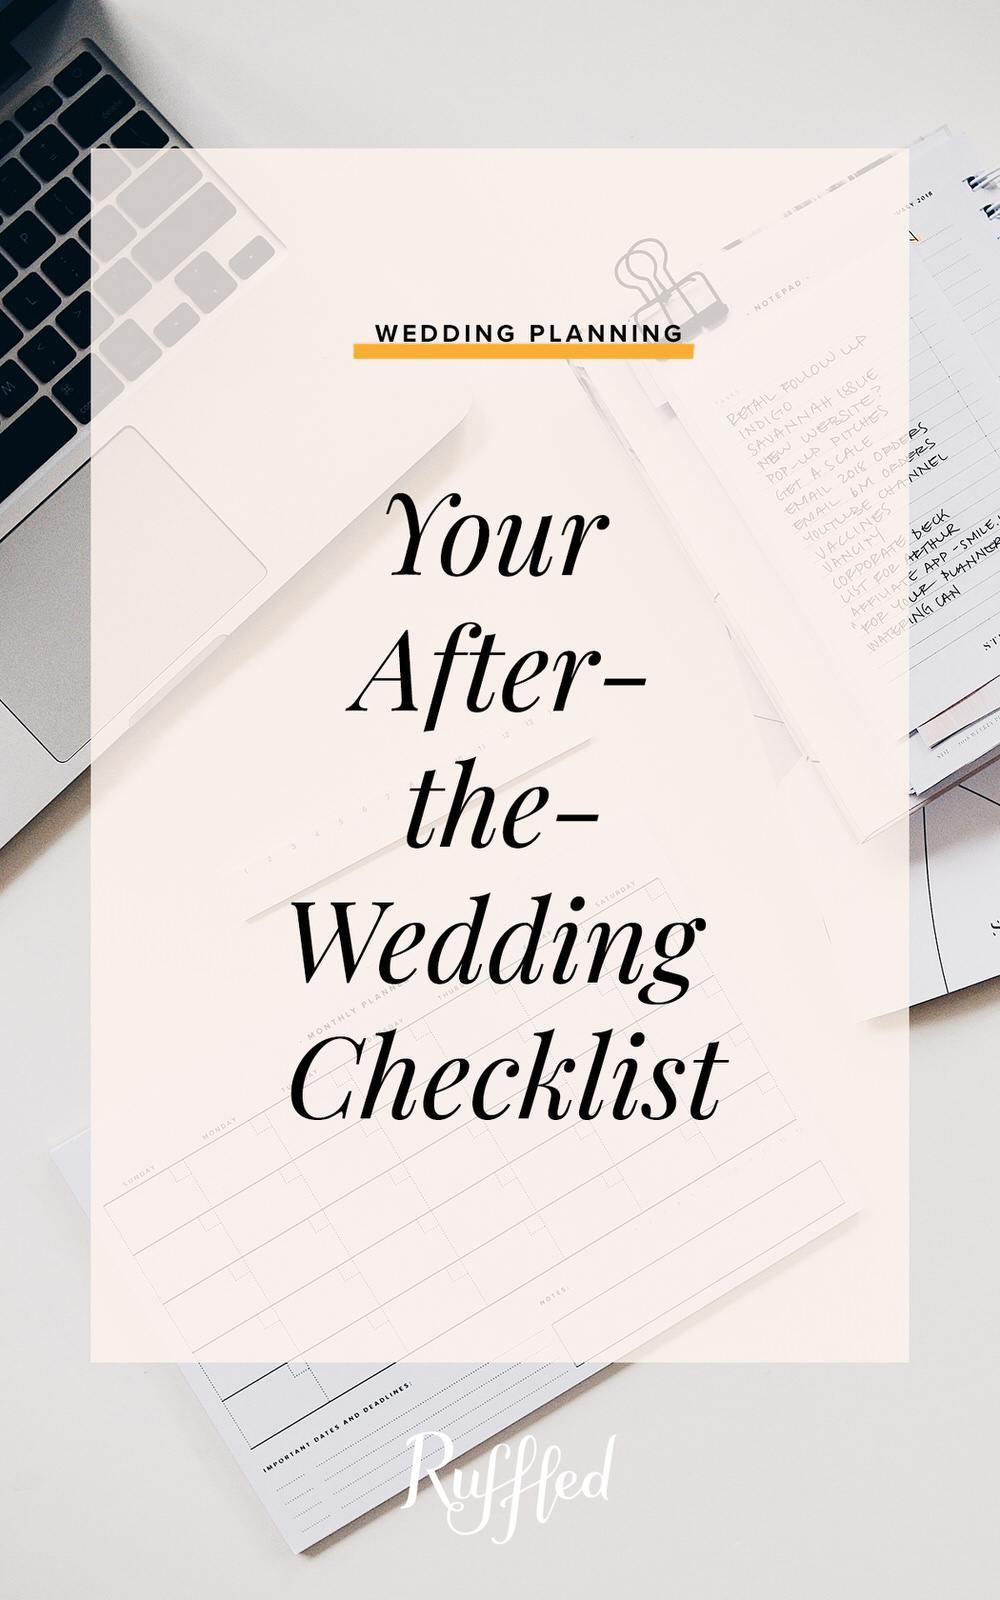 After The Wedding Checklist